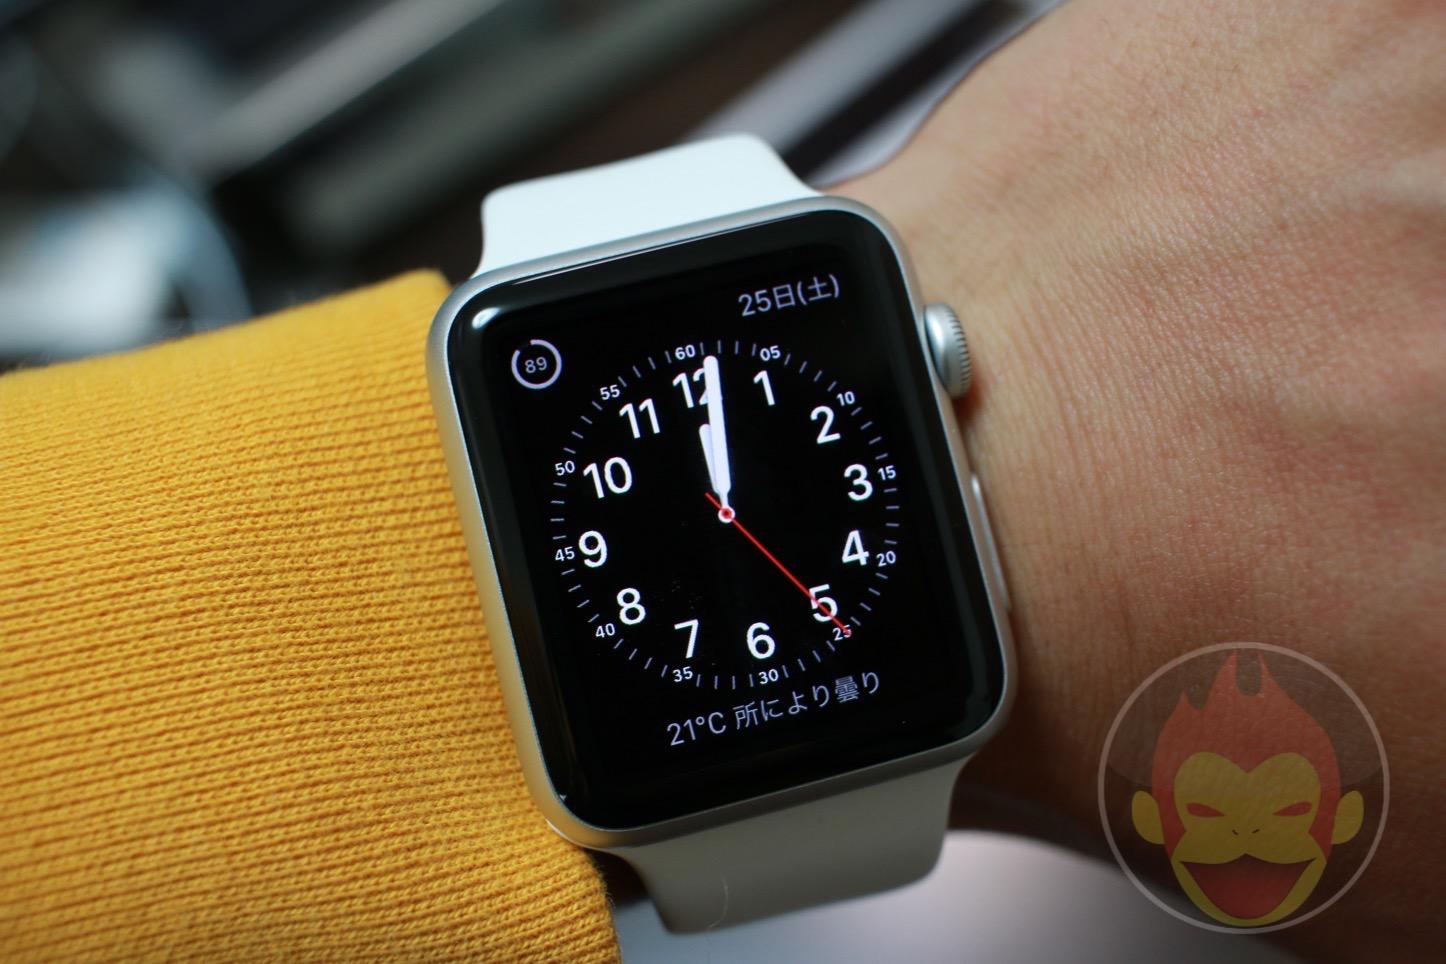 Apple Watchの電池持ちを試してみた